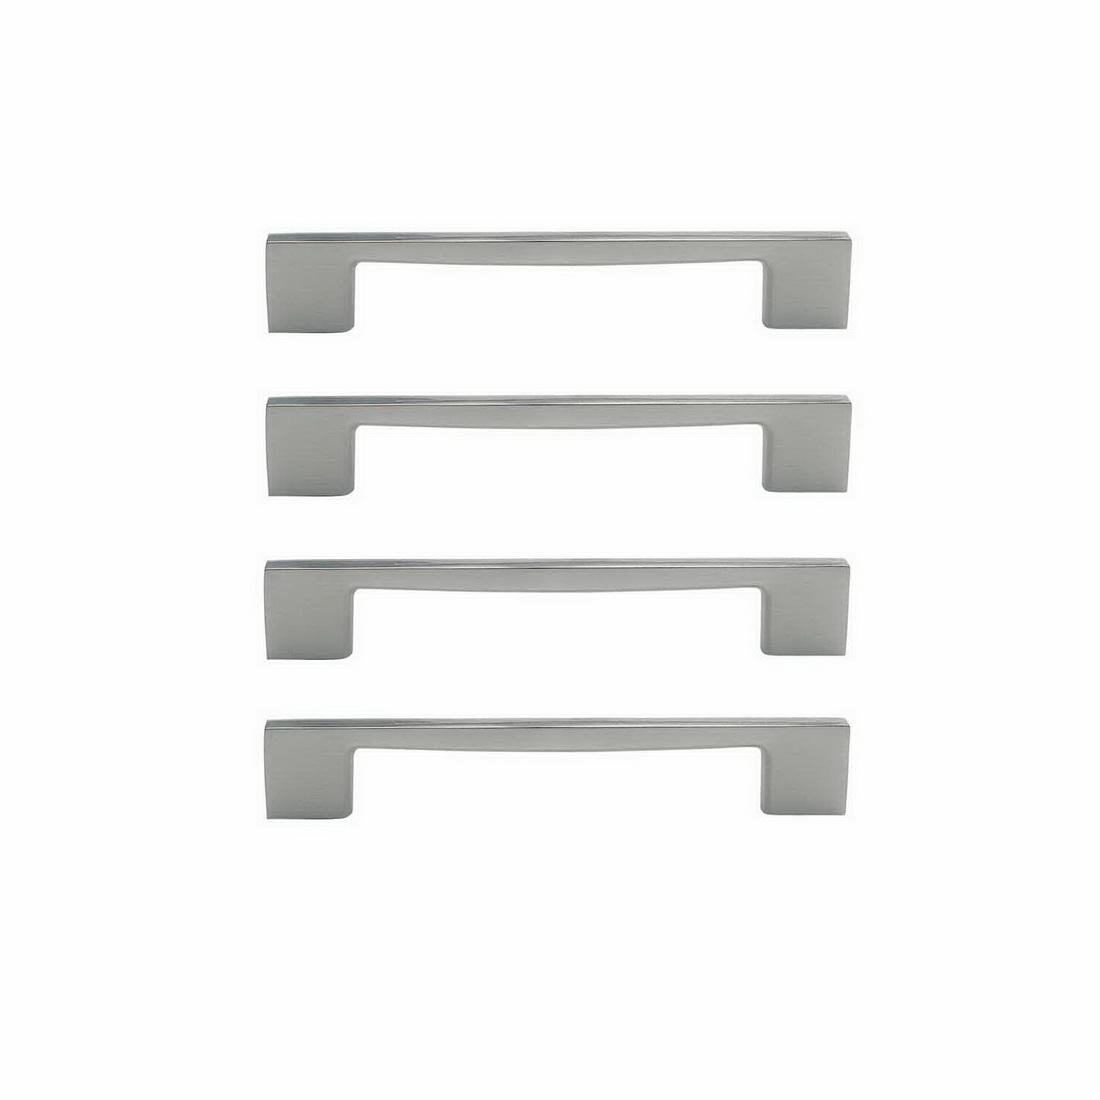 Marco Cabinet Handle 128mm Zinc Die-Cast Brushed Nickel 4 pack 6337-4-BN